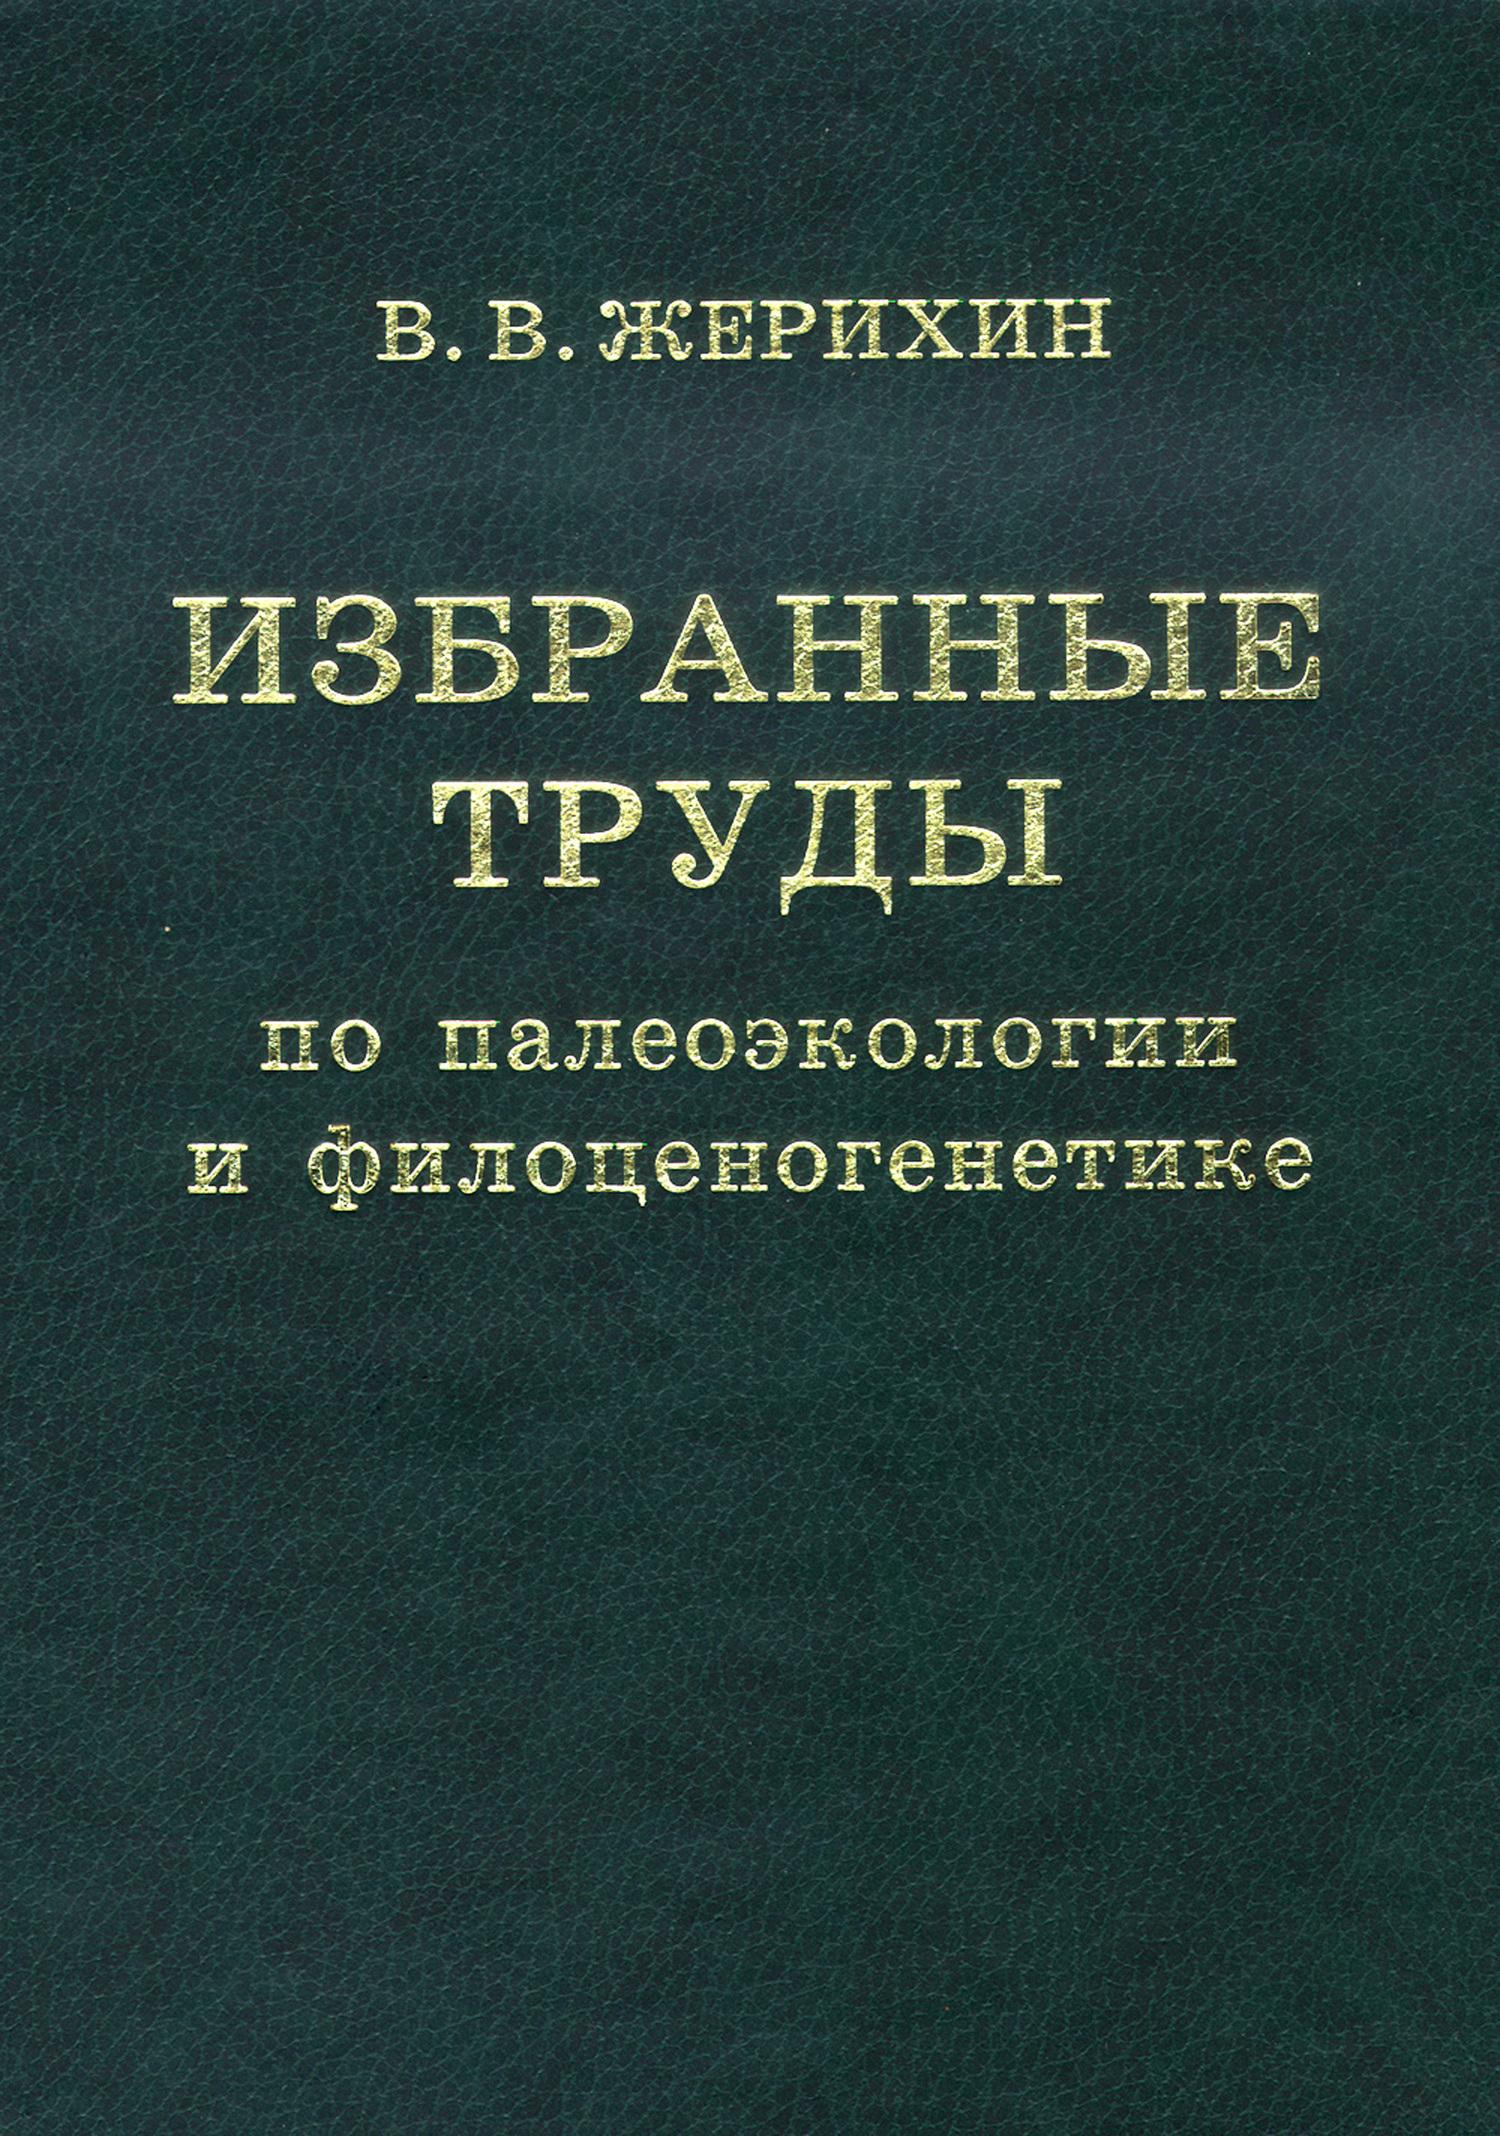 Владимир Жерихин бесплатно